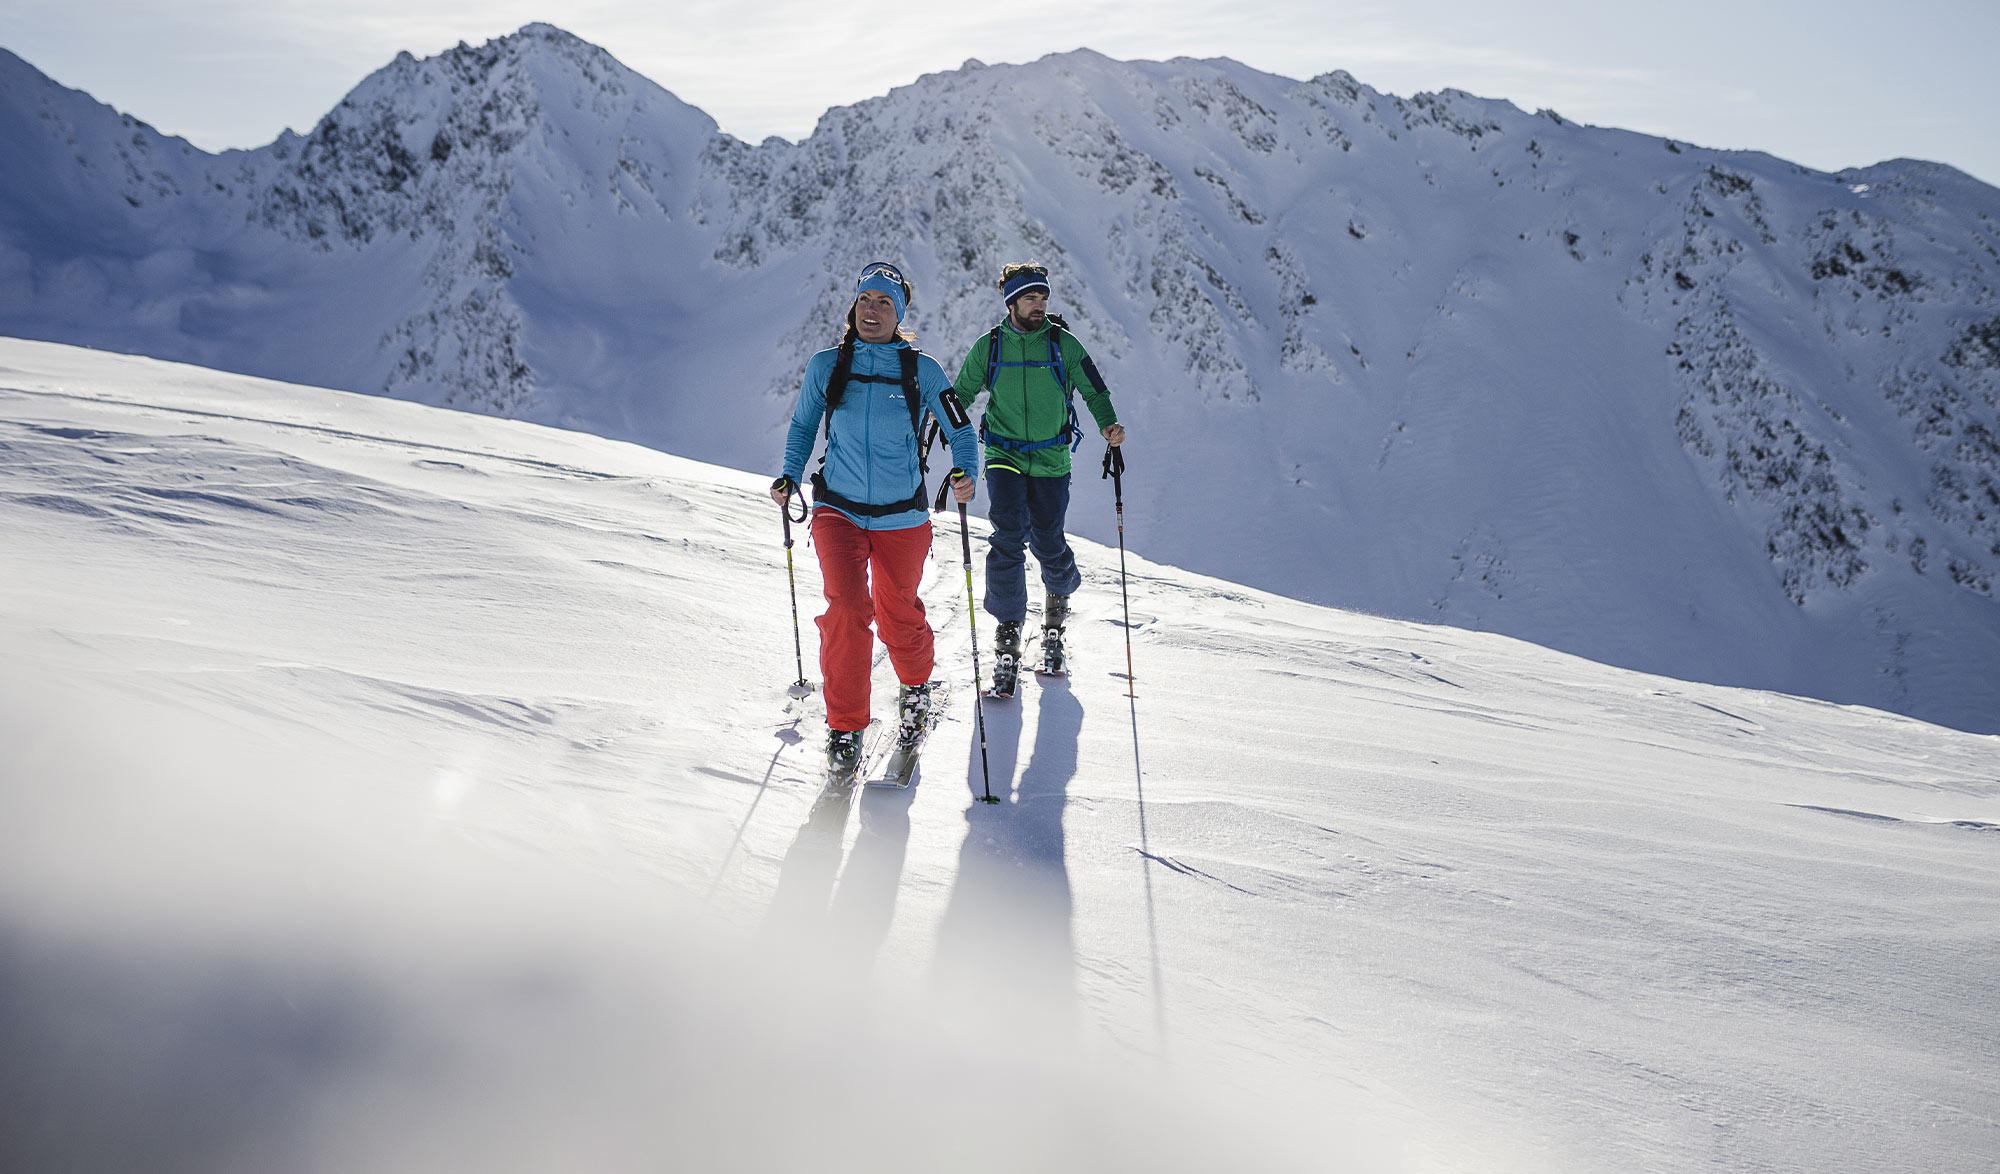 Débuter en ski de randonnée